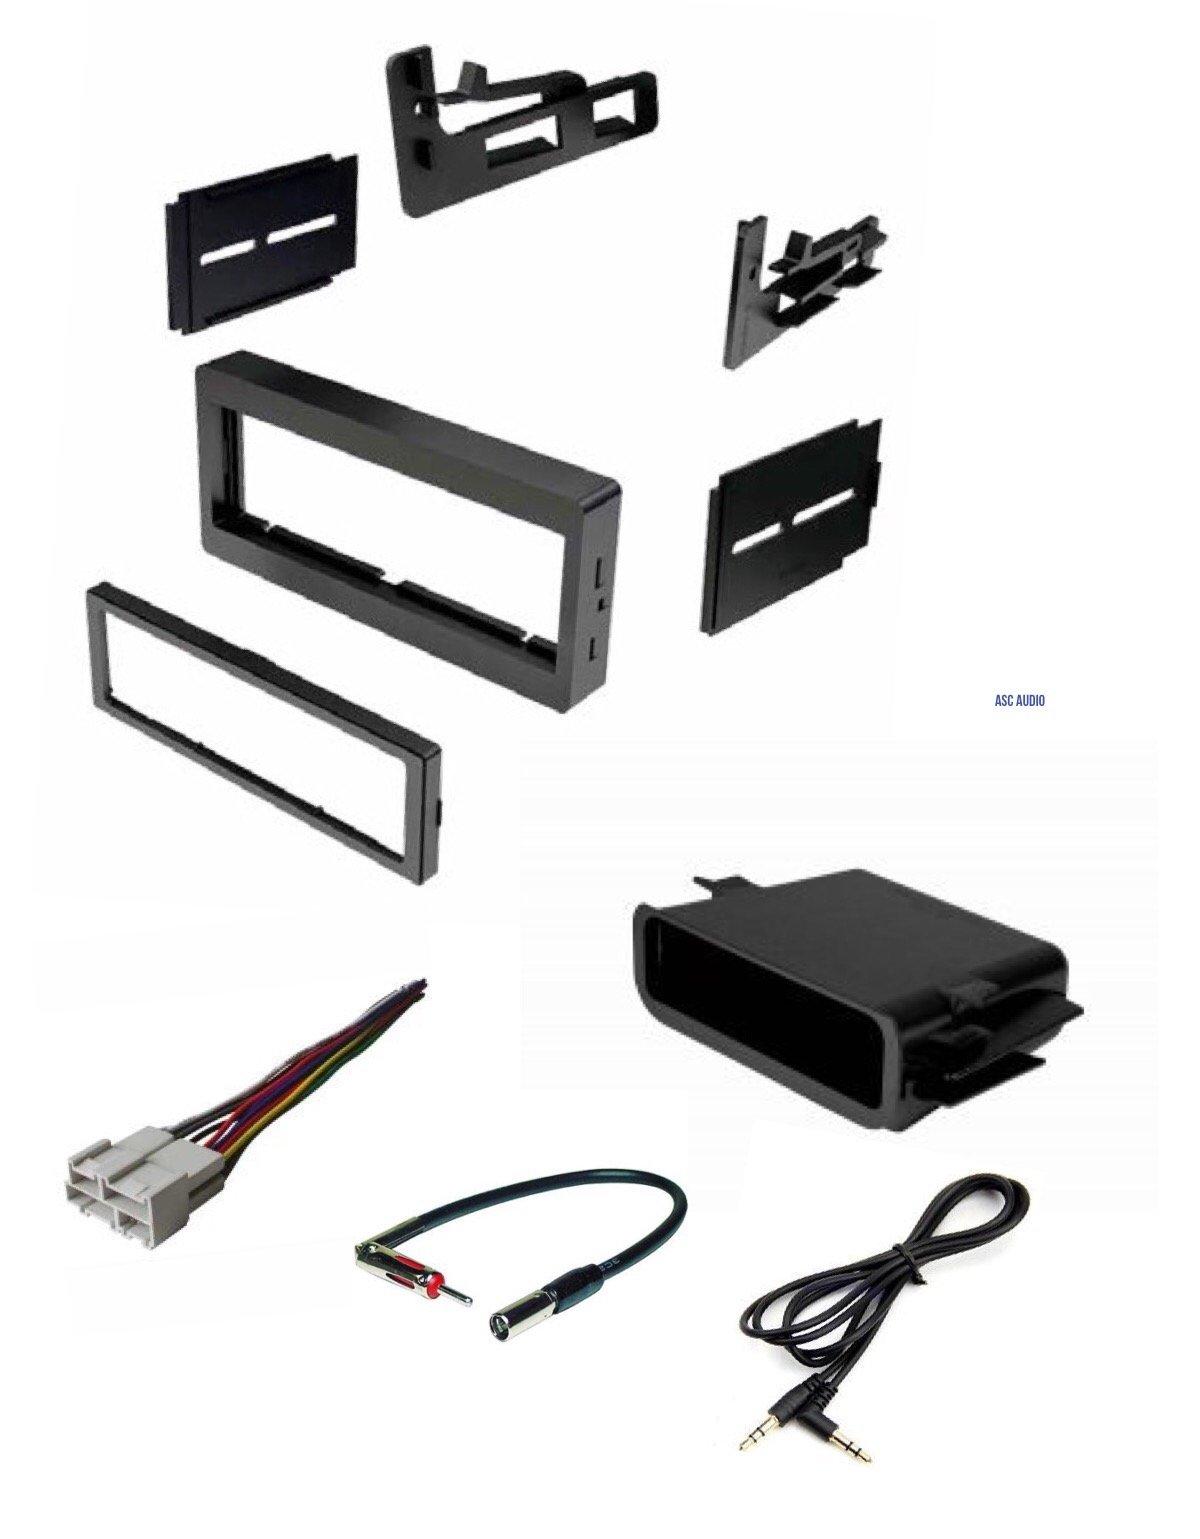 Car Stereo Dash Kit, Wire Harness, Antenna Adapter, Pocket for Installing a Single Din Radio for some 95-02 Chevrolet Astro Avalanche Express Silverado Suburban Tahoe GMC Sierra Yukon - No Premium Amp